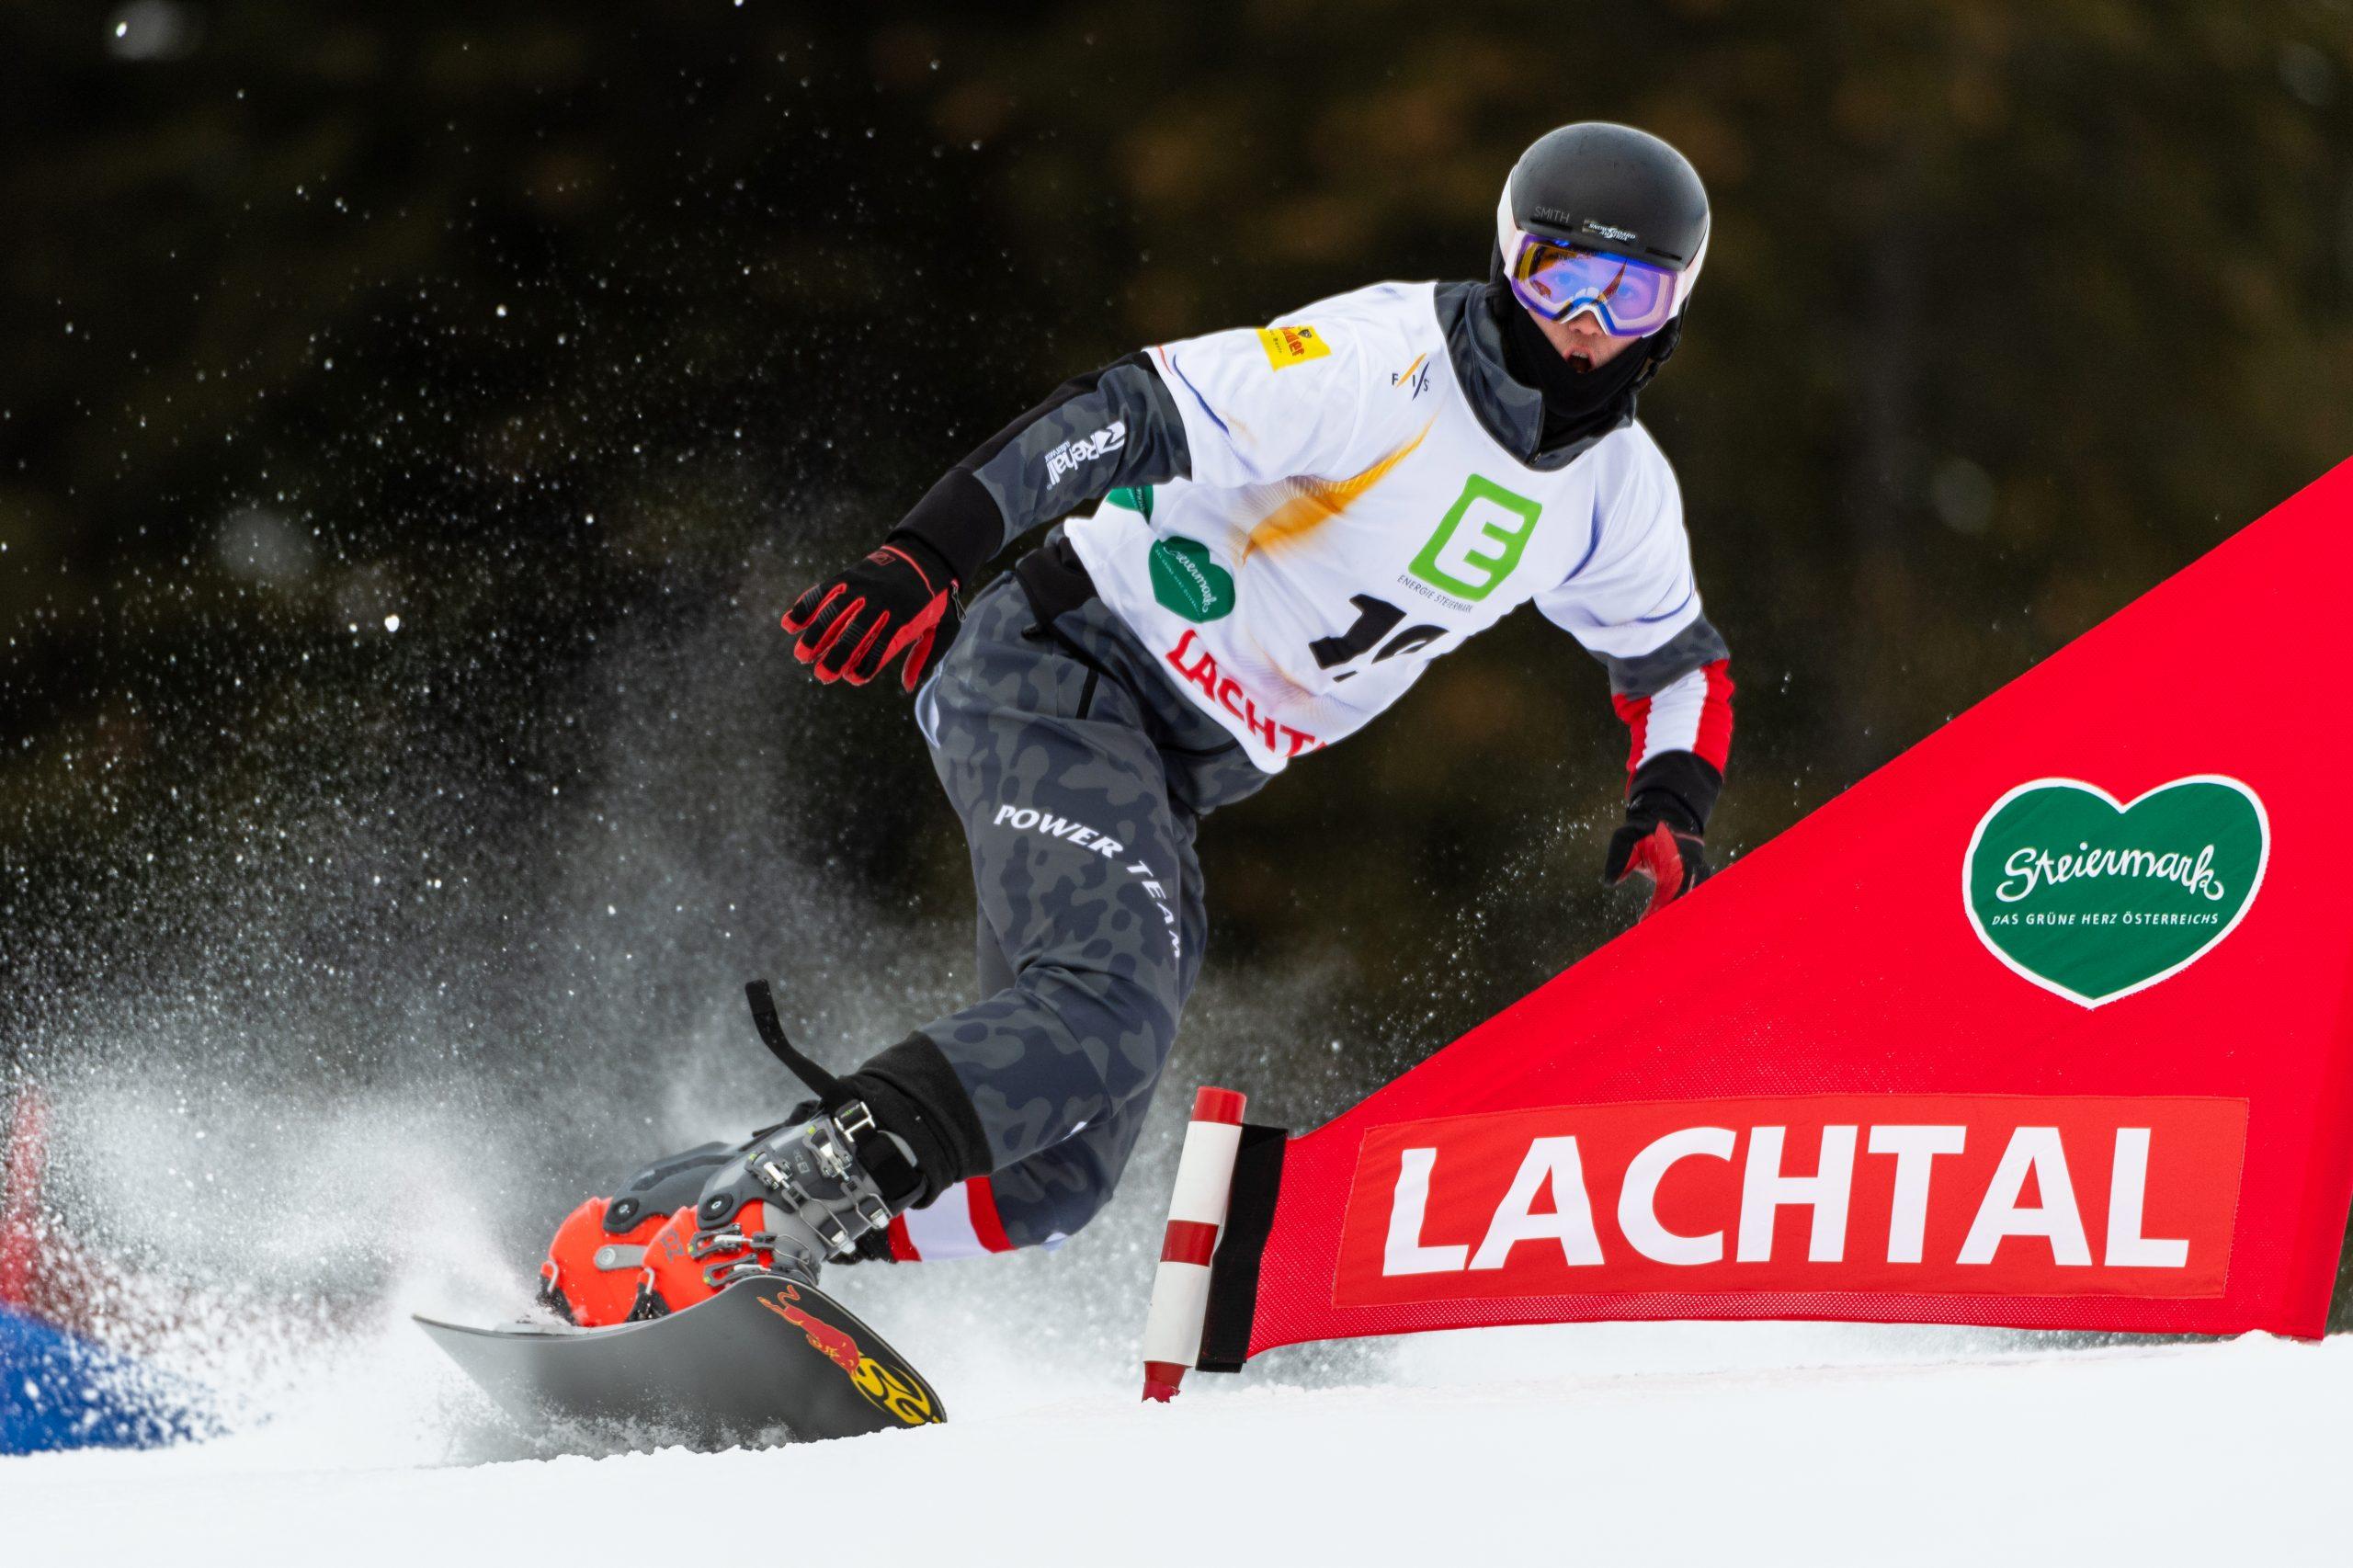 FIS Junior World Championship - Lachtal AUT - PSL - BURGSTALLER Dominik AUT © Miha Matavz/FIS